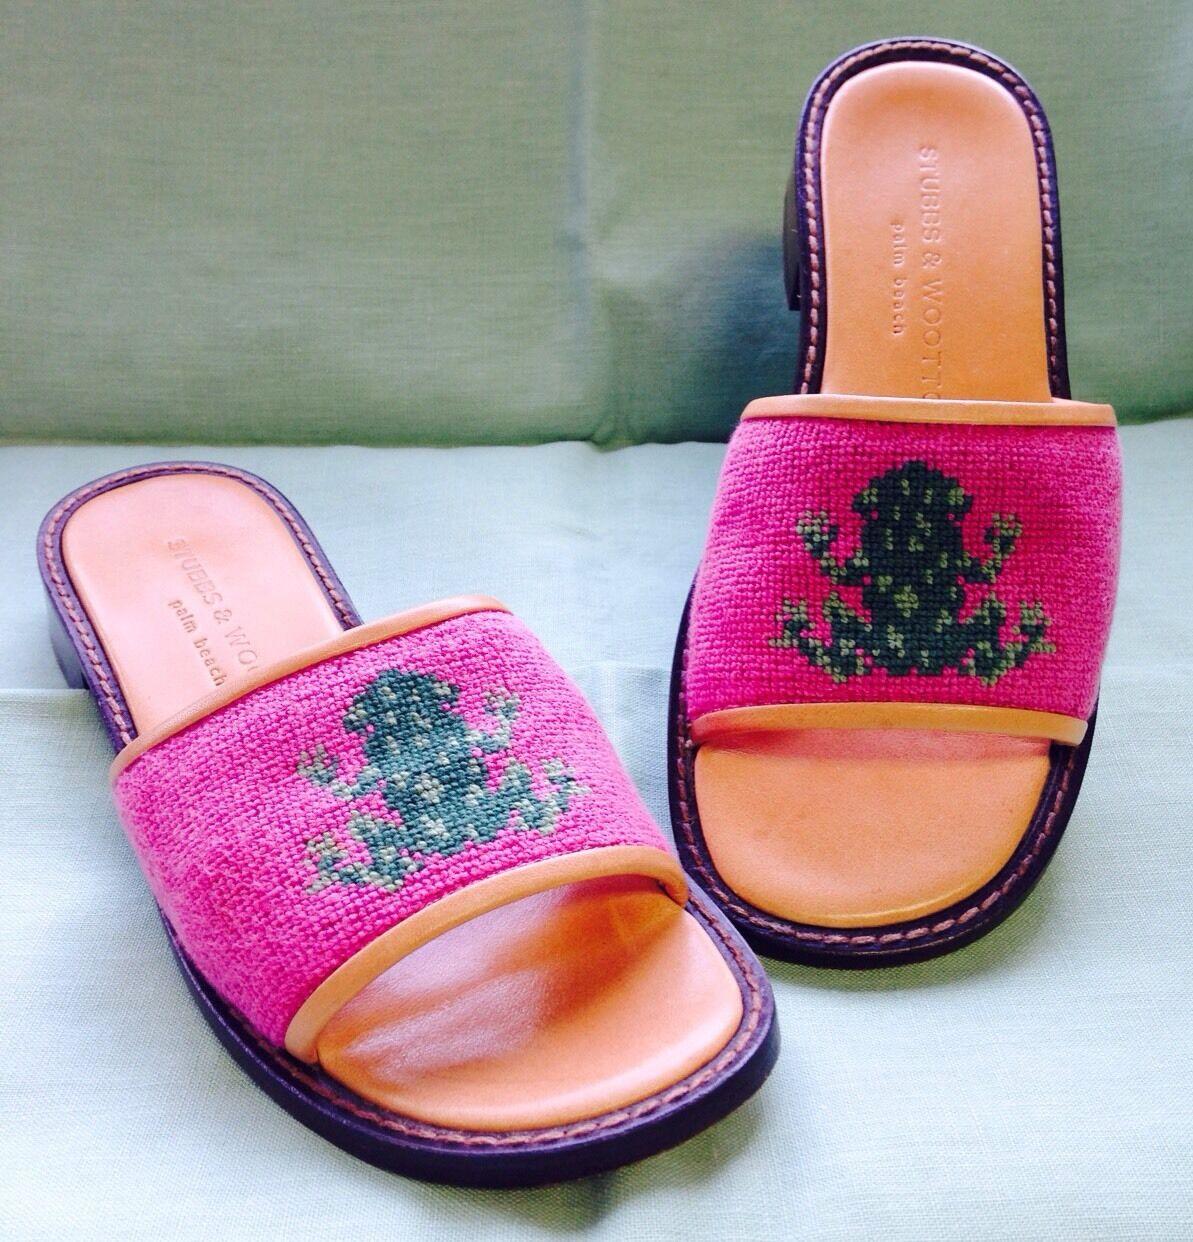 Stubbs & Wooten Palm Beach Italian Pink Frog Needlepoint Leather Sandals 5-1 2